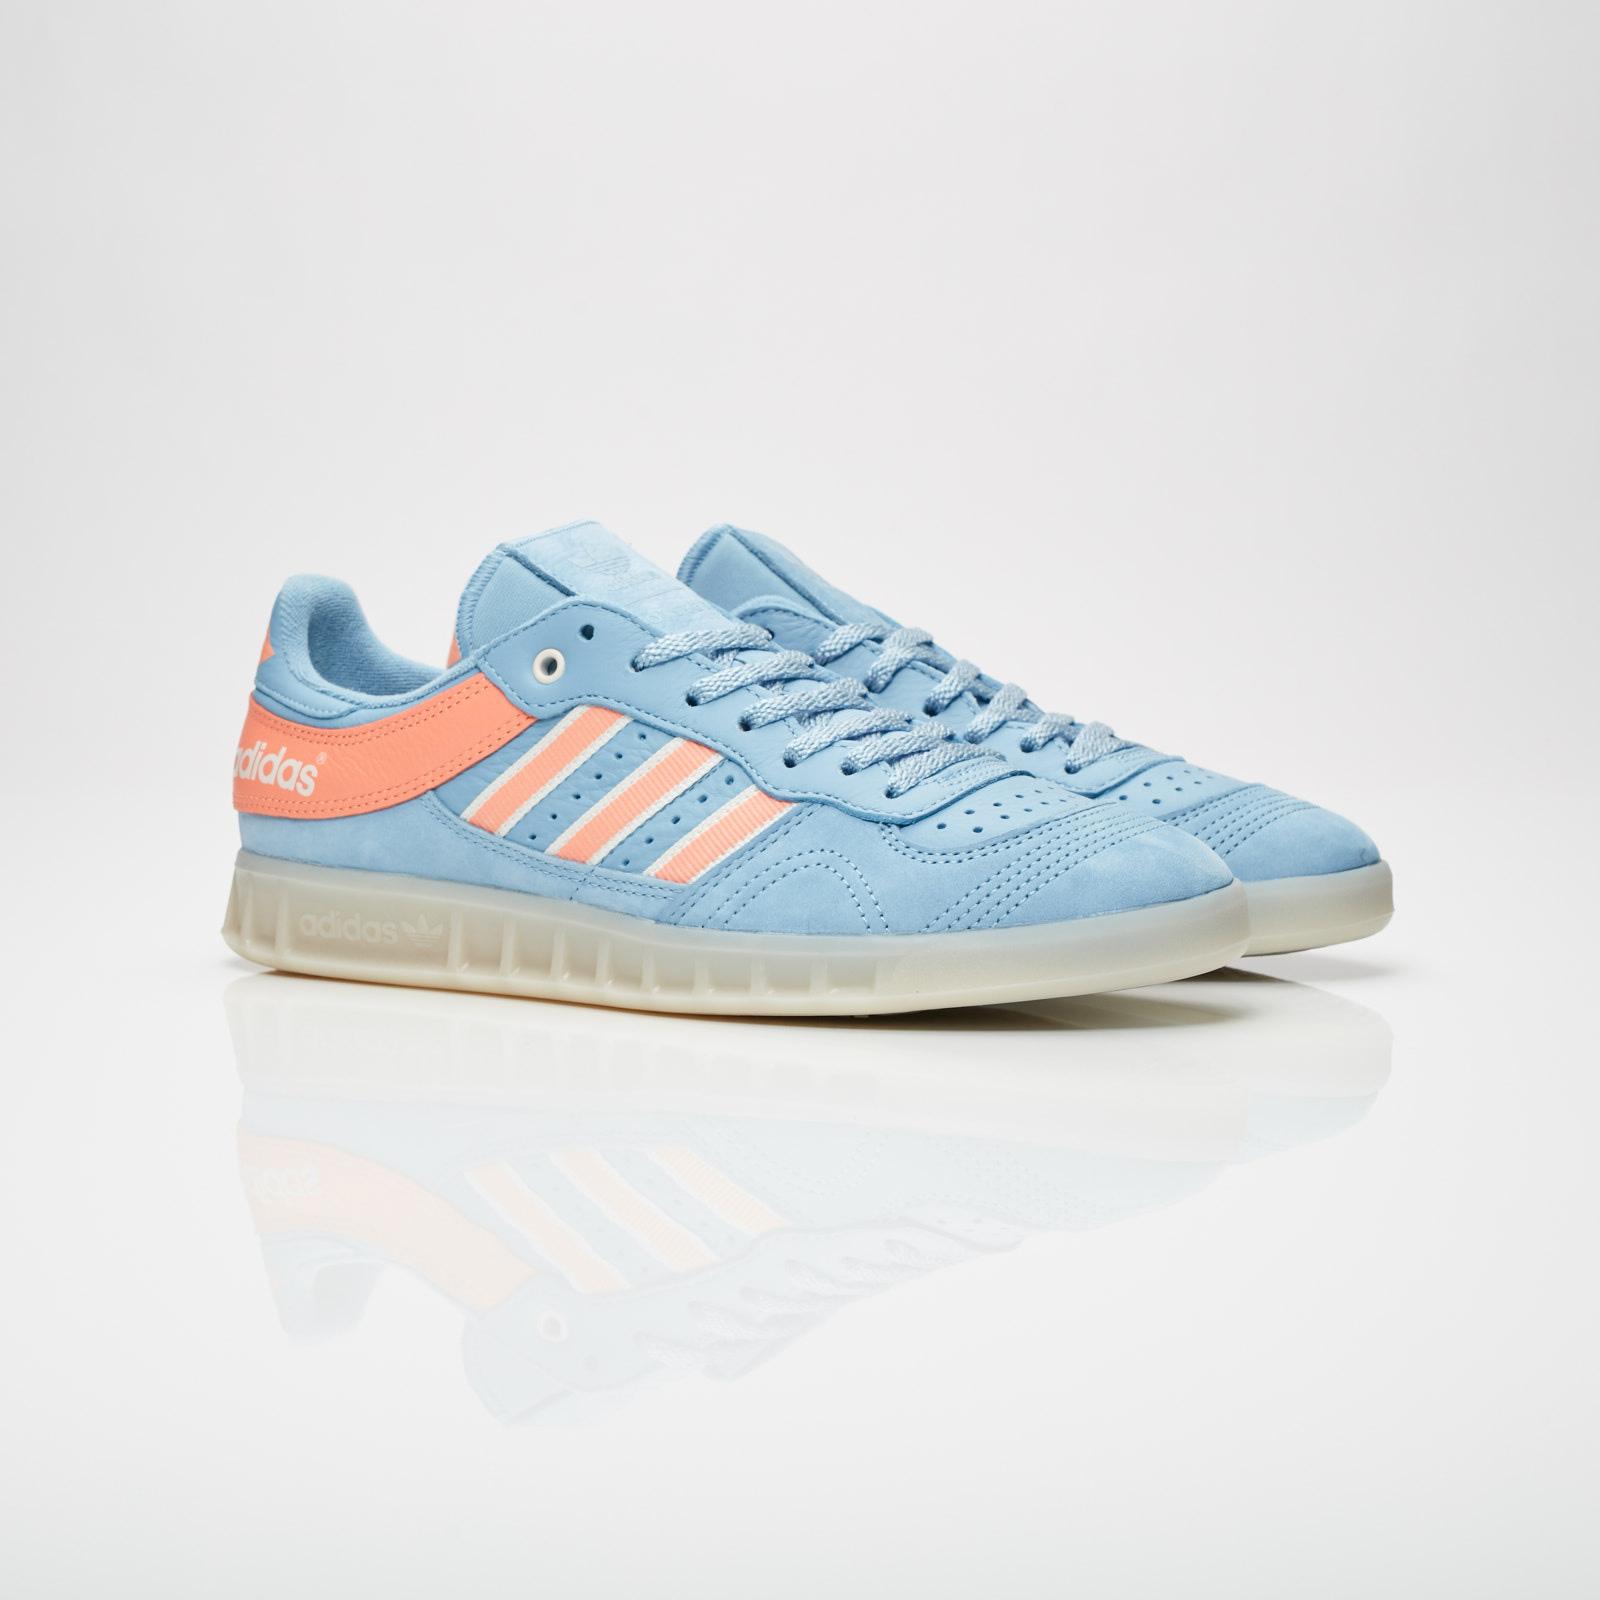 on sale 8c916 05c9b adidas Handball Top x Oyster - Db1978 - Sneakersnstuff ...